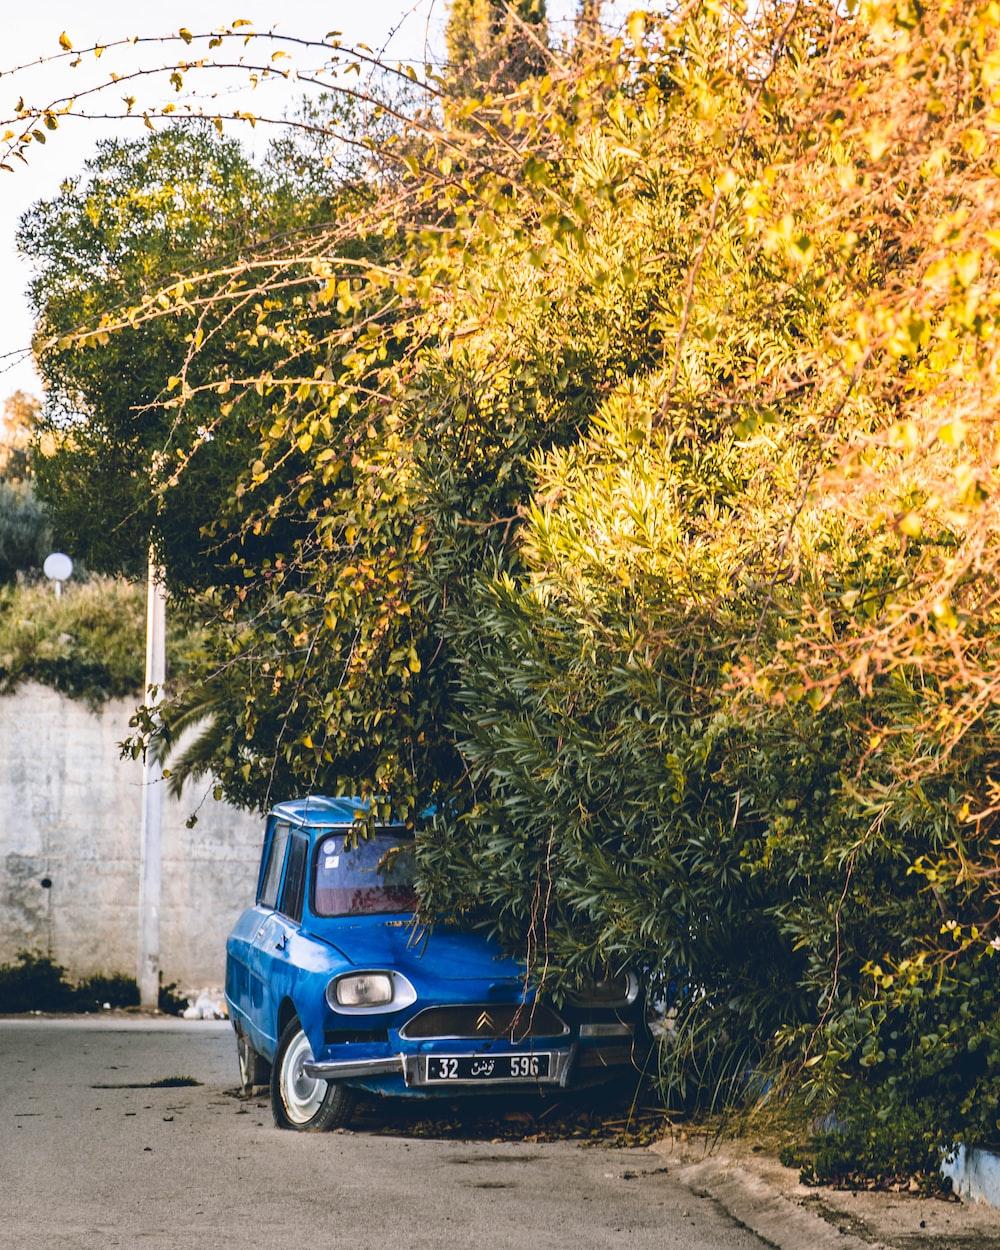 blue vehicle under vine plant